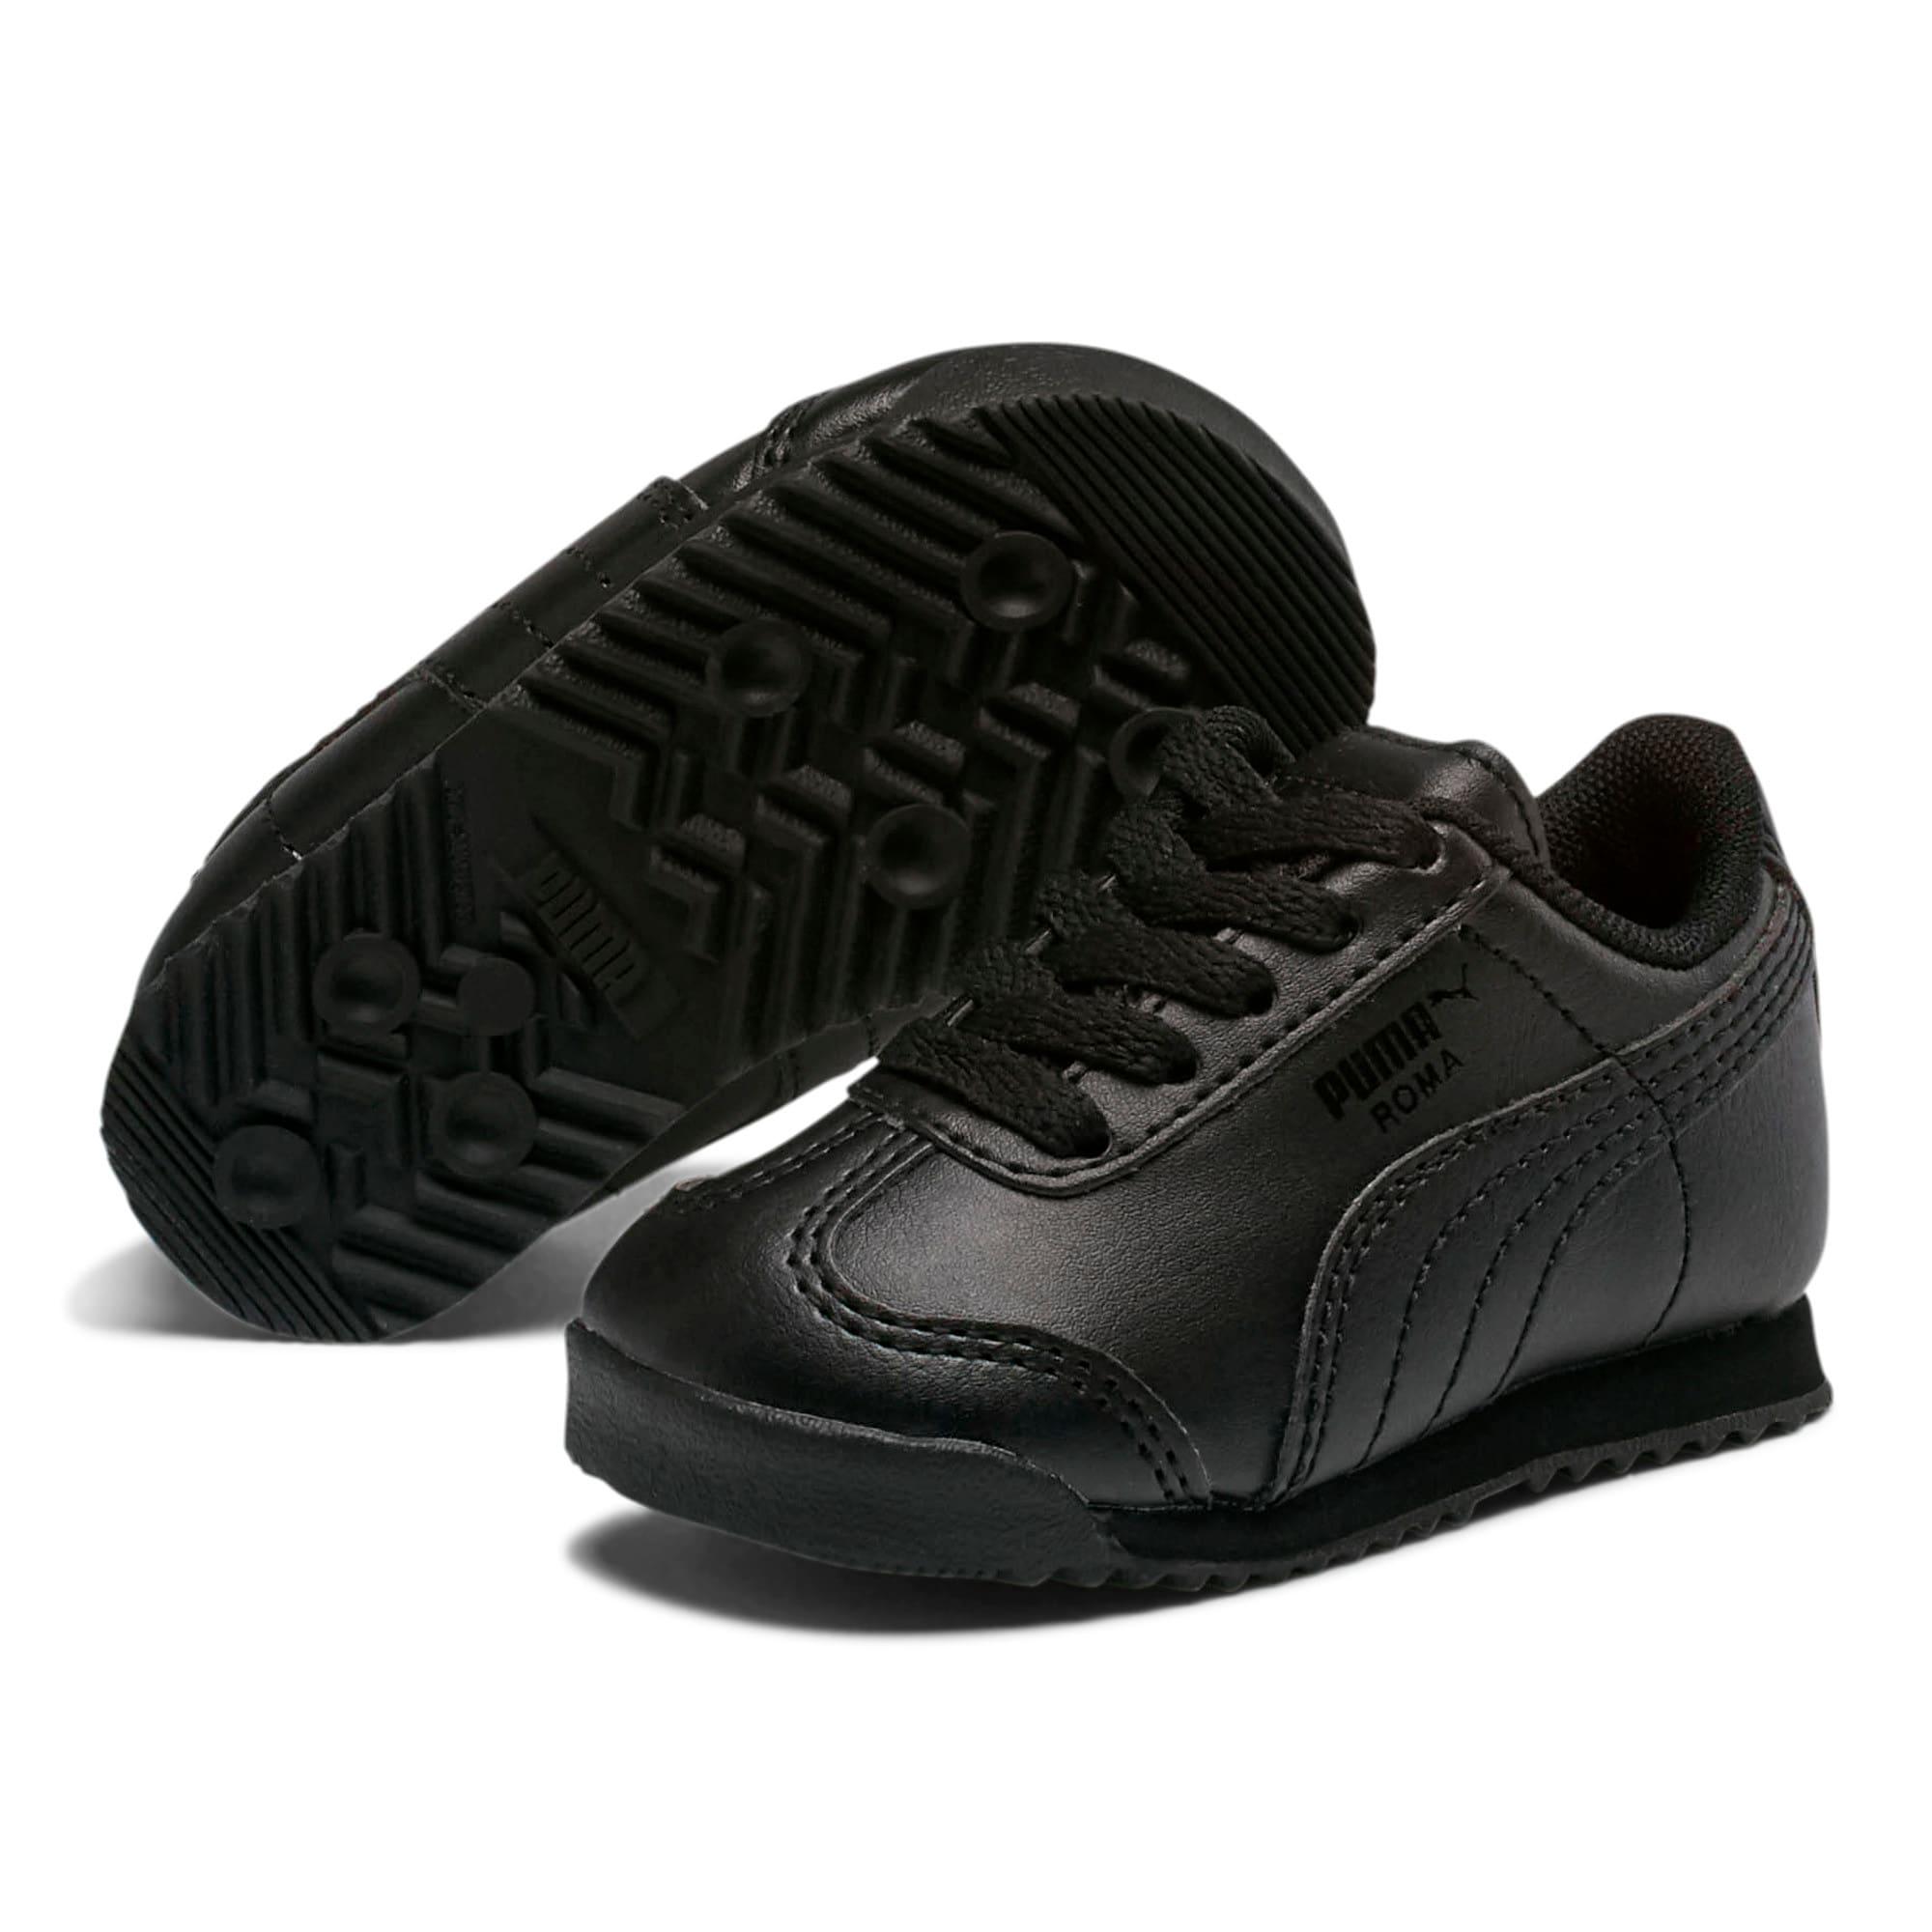 Thumbnail 2 of Roma Basic Toddler Shoes, black-black, medium